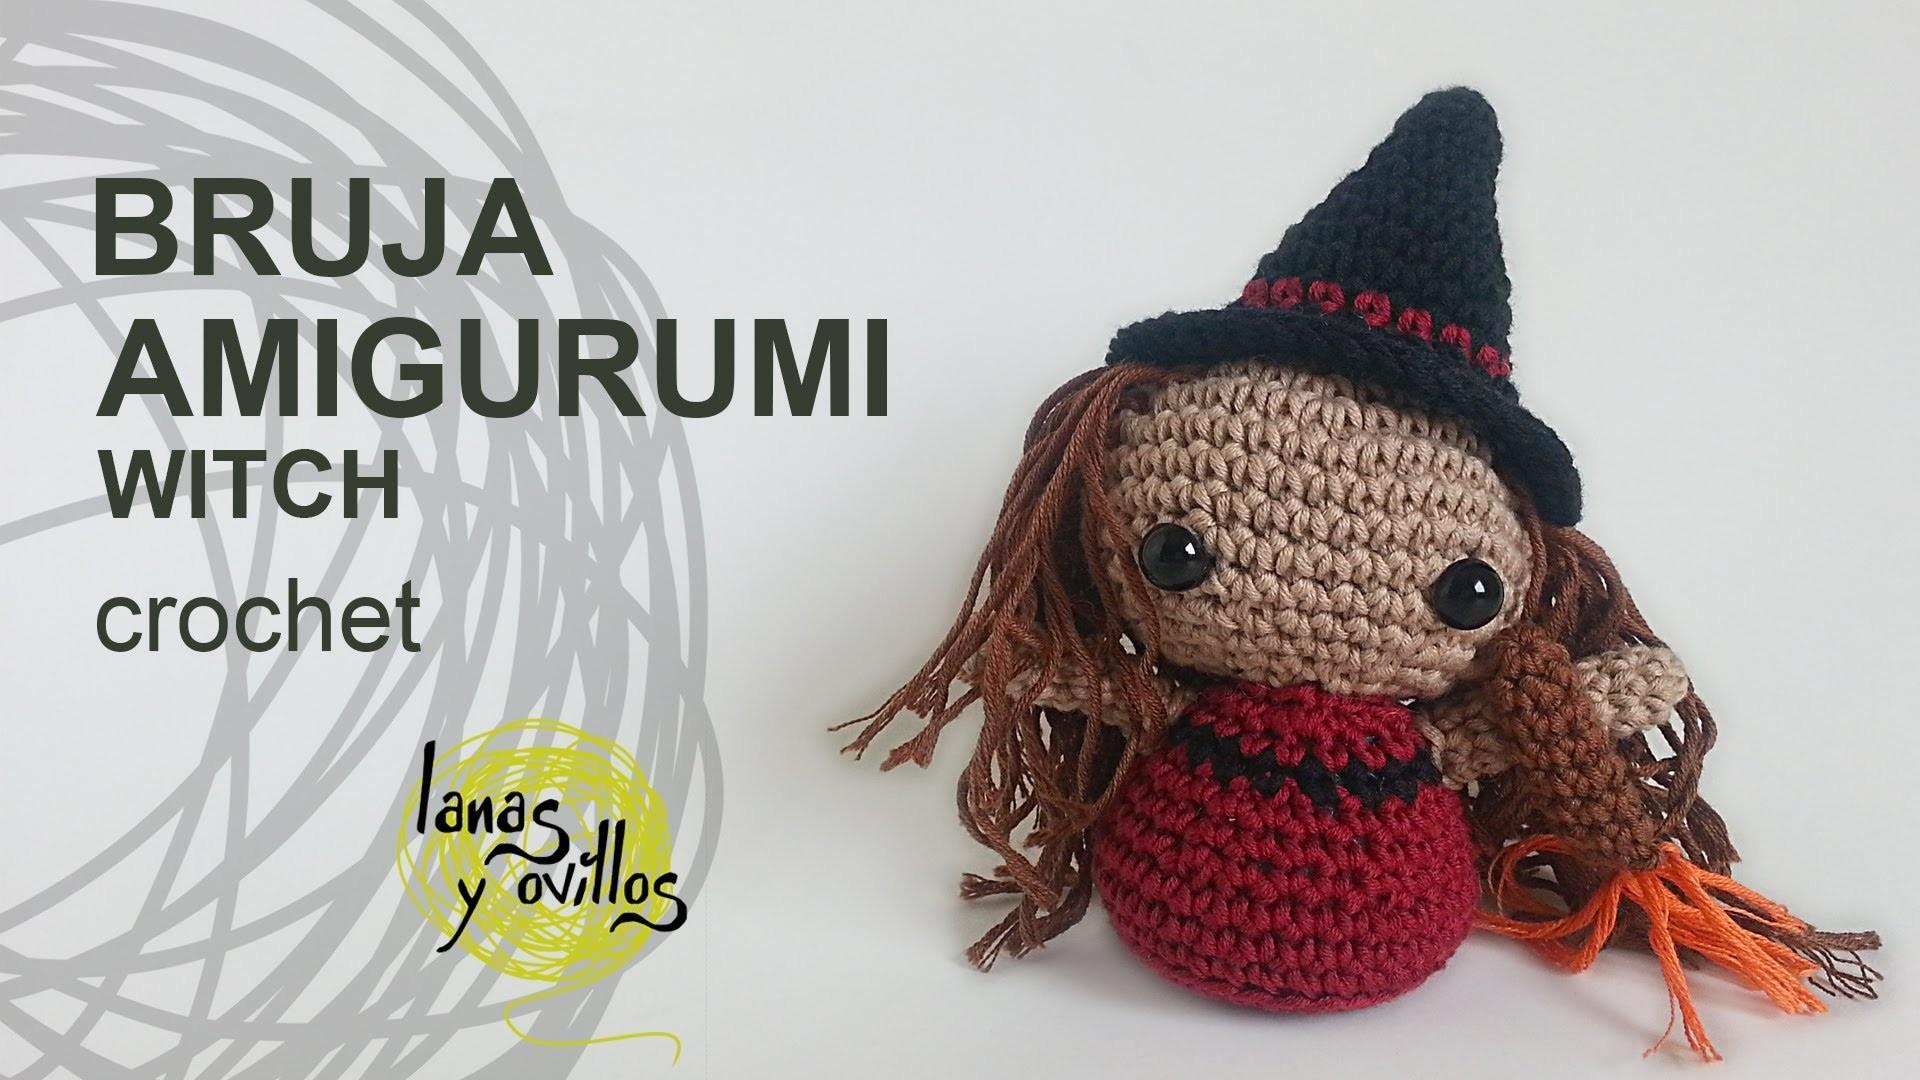 Tutorial Amigurumi Bruja Witch